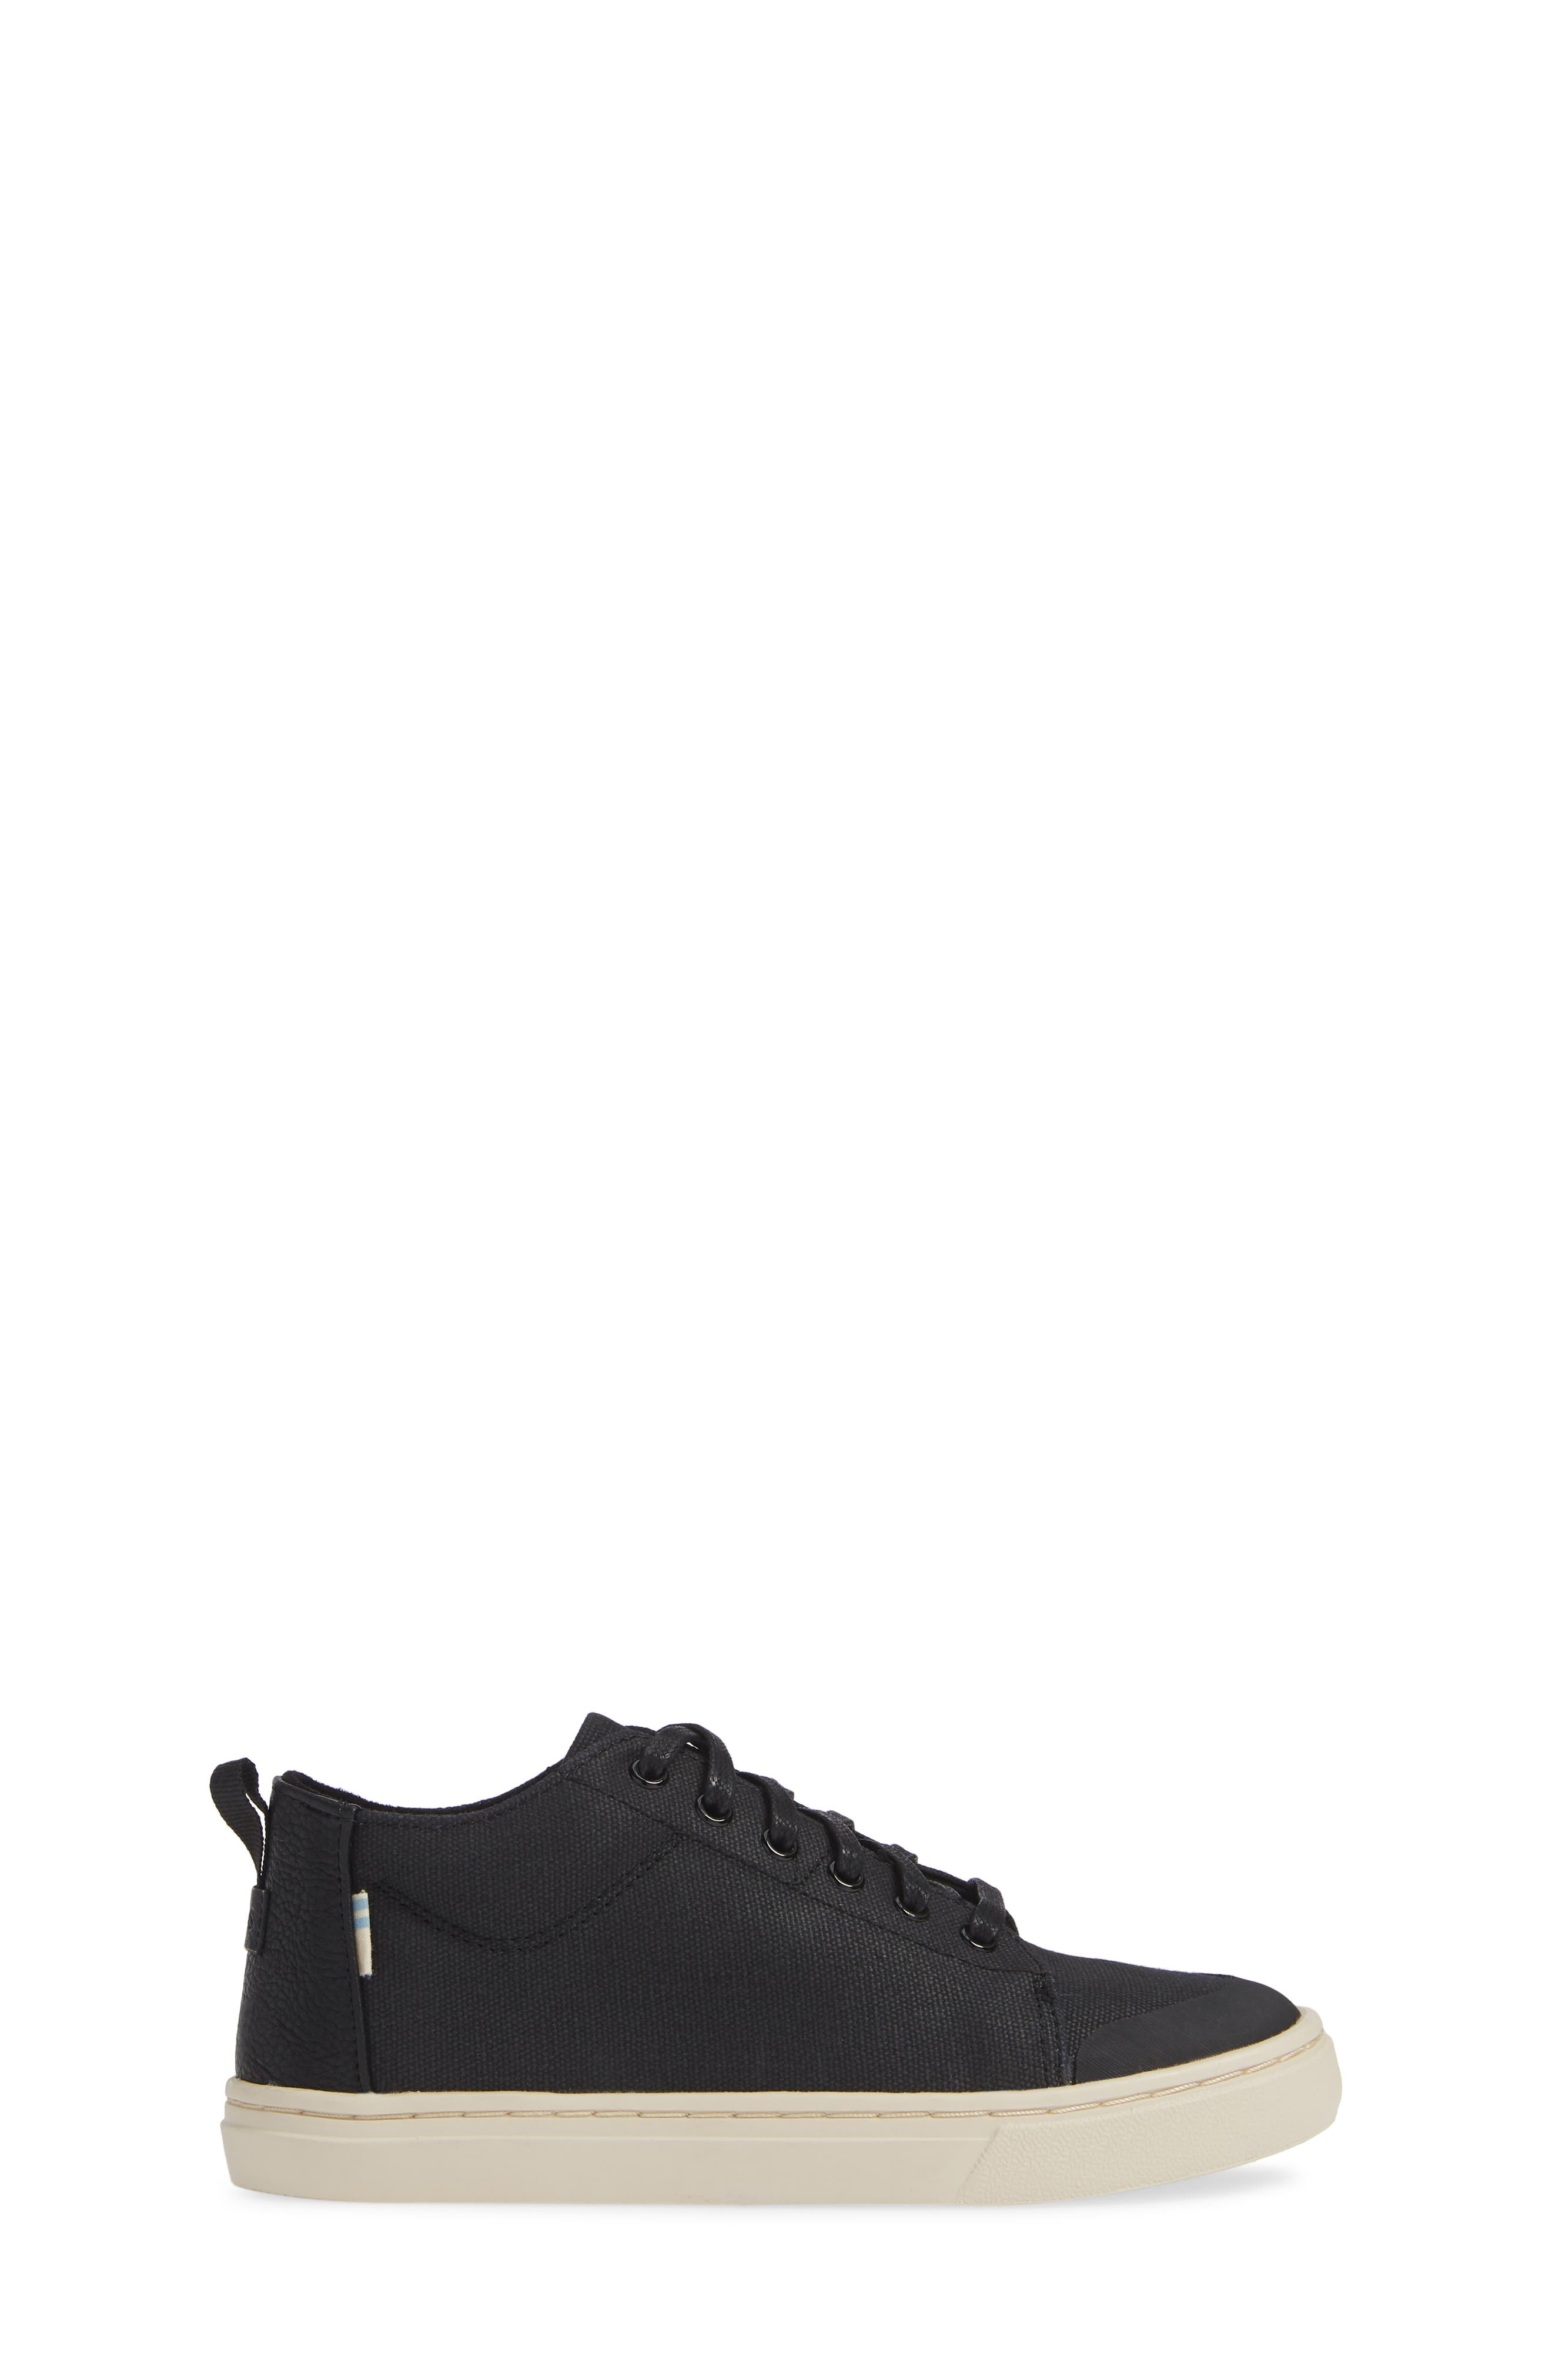 Lenny Mid Top Sneaker,                             Alternate thumbnail 3, color,                             BLACK TEXTURAL CANVAS